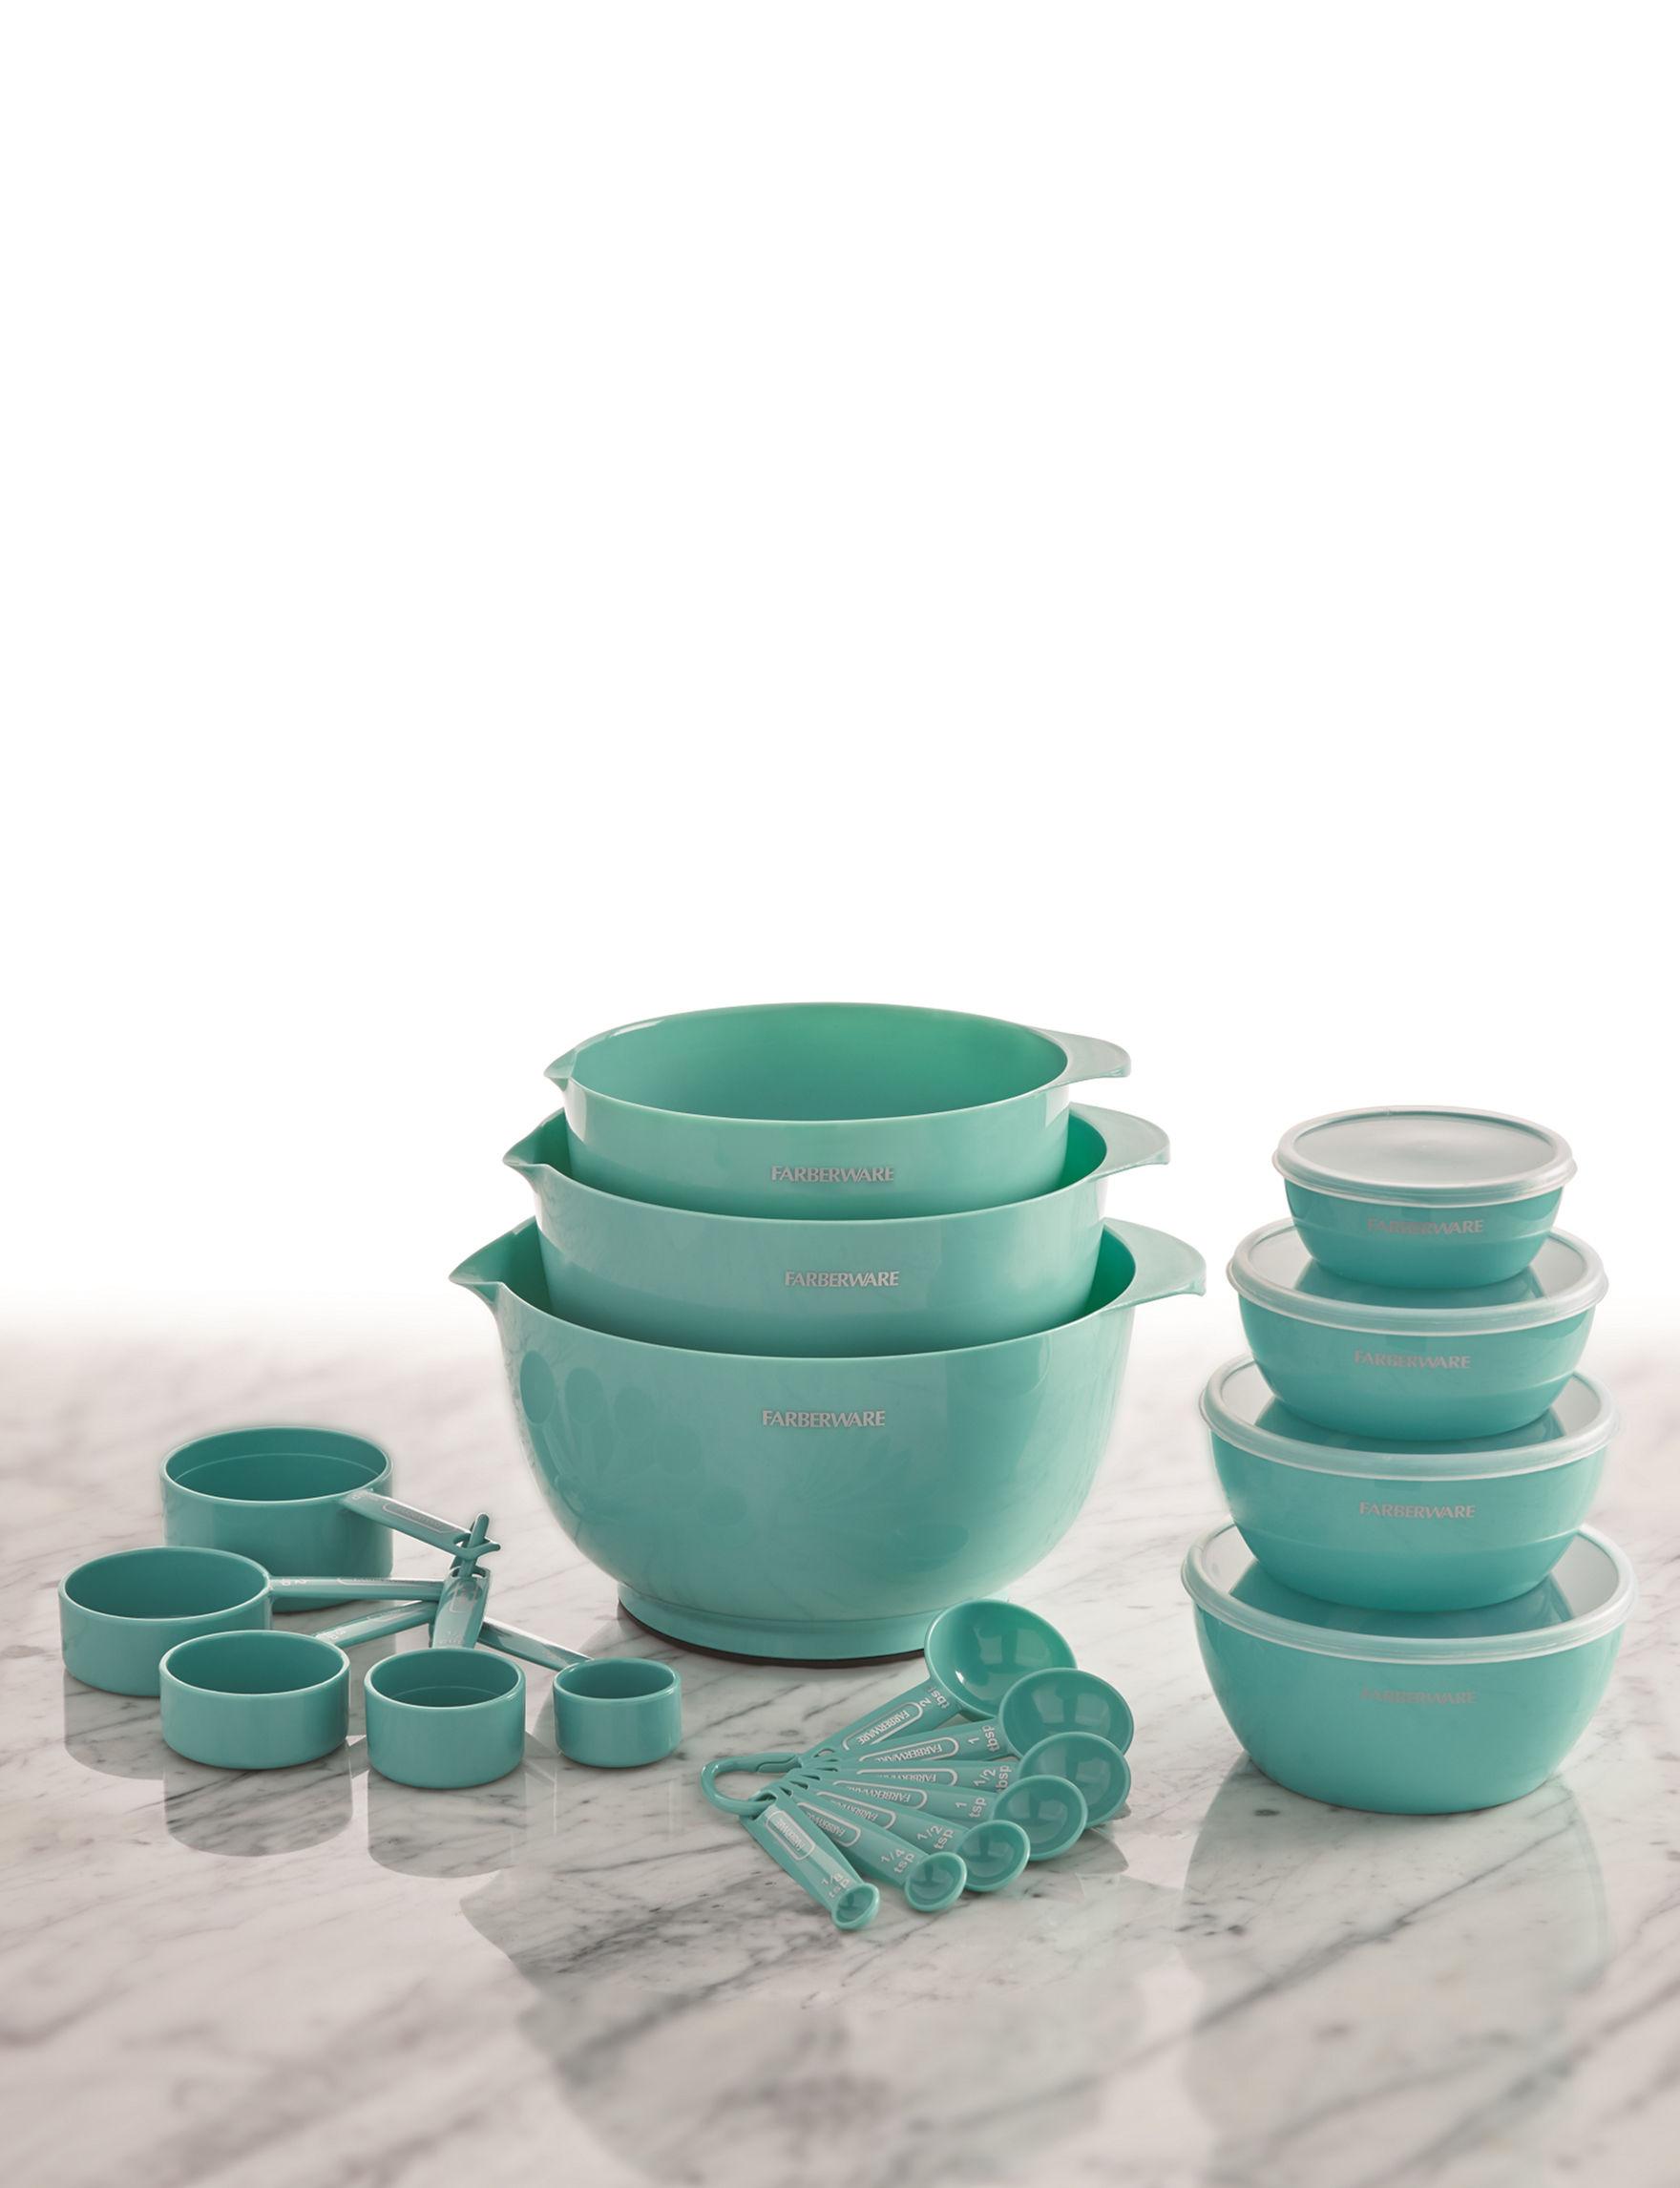 Farberware  Bakeware Sets Measuring Cups & Spoons Mixing Bowls Bakeware Kitchen Storage & Organization Prep & Tools